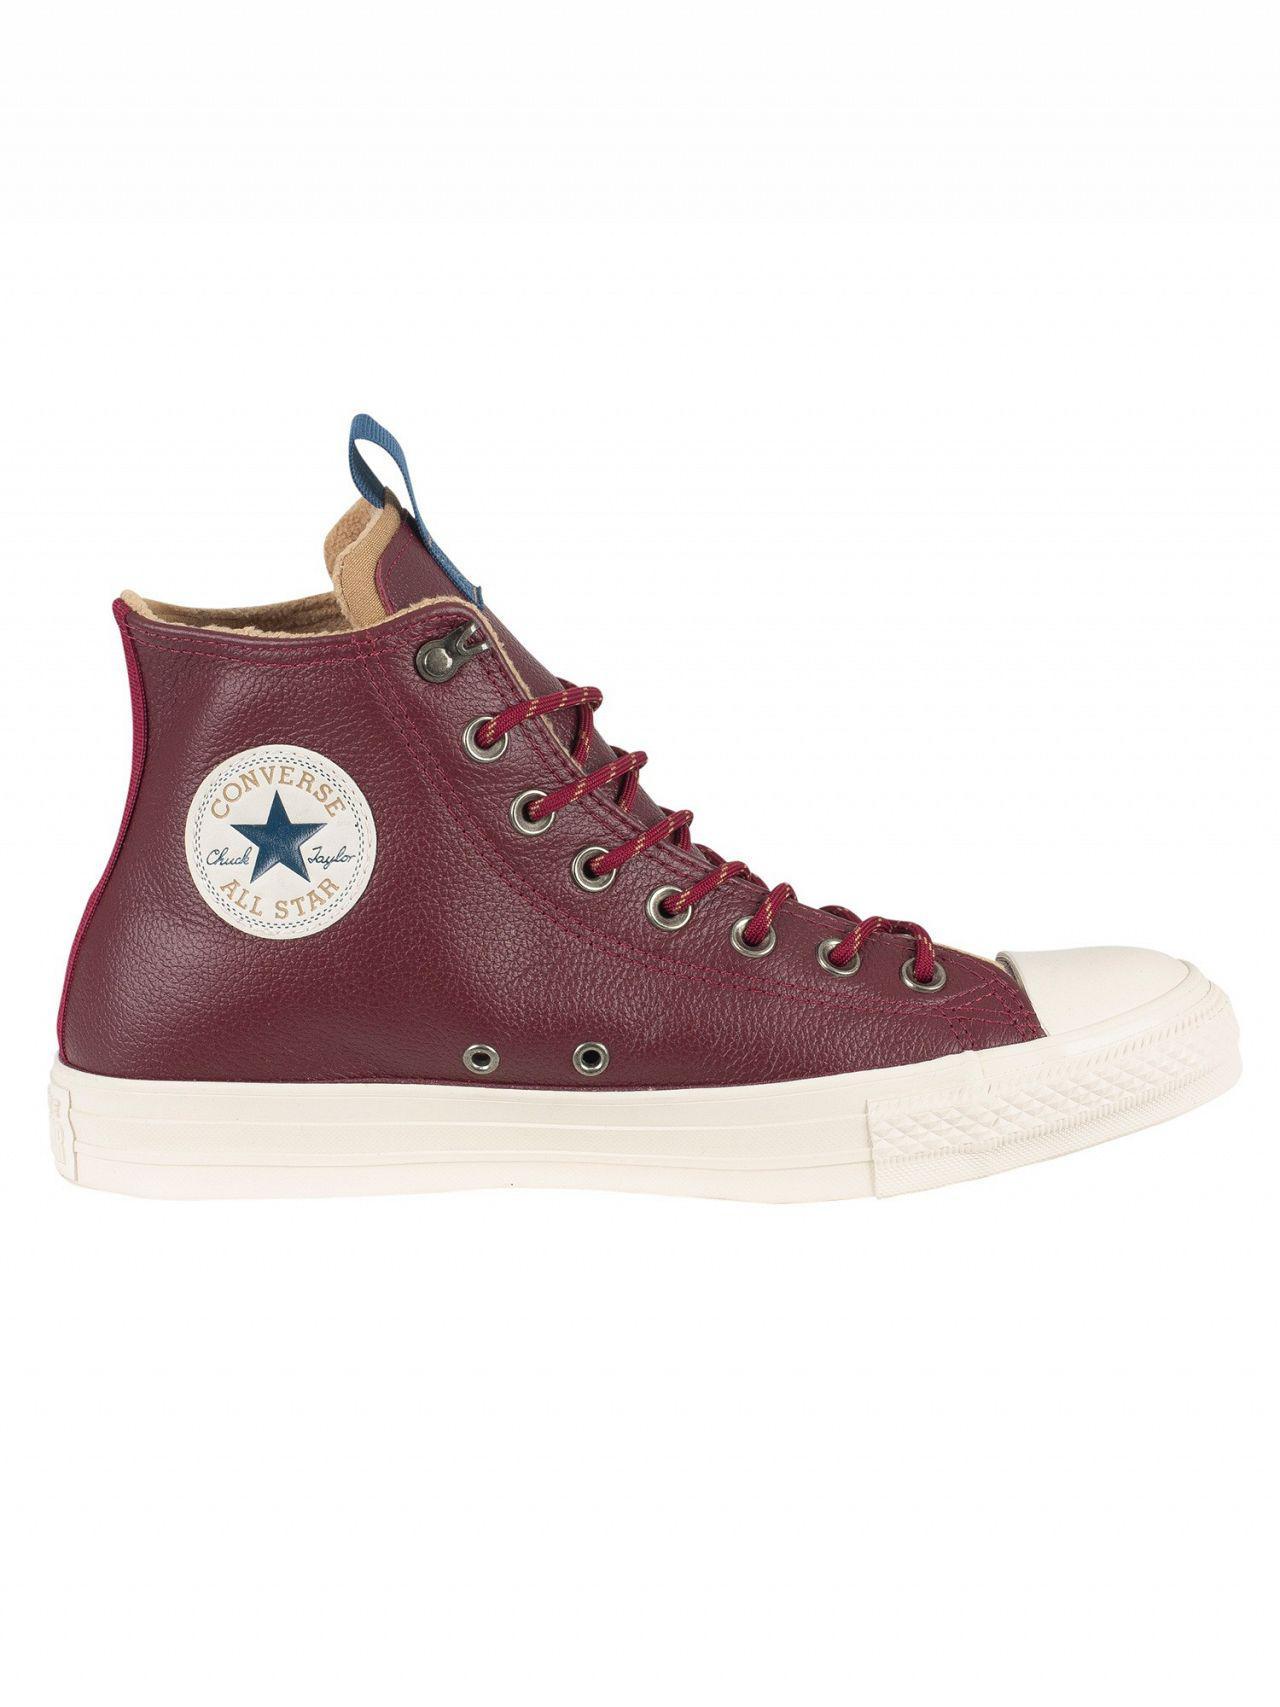 67533c7e22c4 Lyst - Converse Dark Burgundy teak driftwood Ct All Star Leather ...